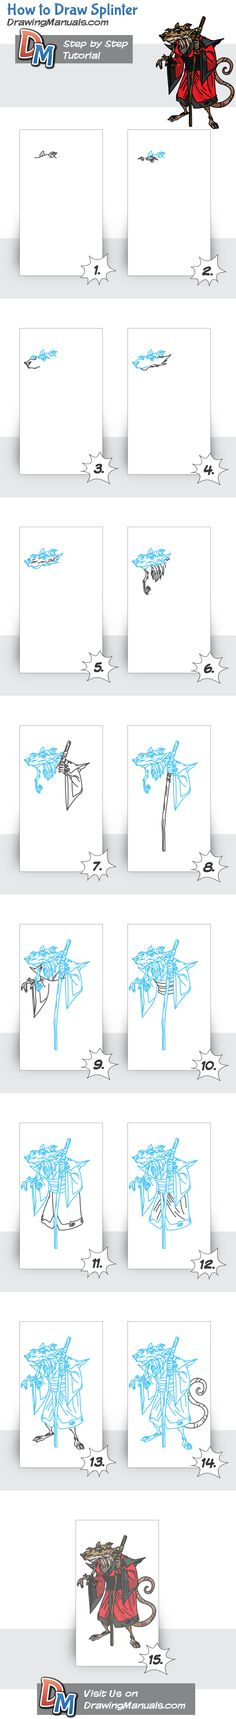 How to Draw Splinter from TMNT, Cartoons